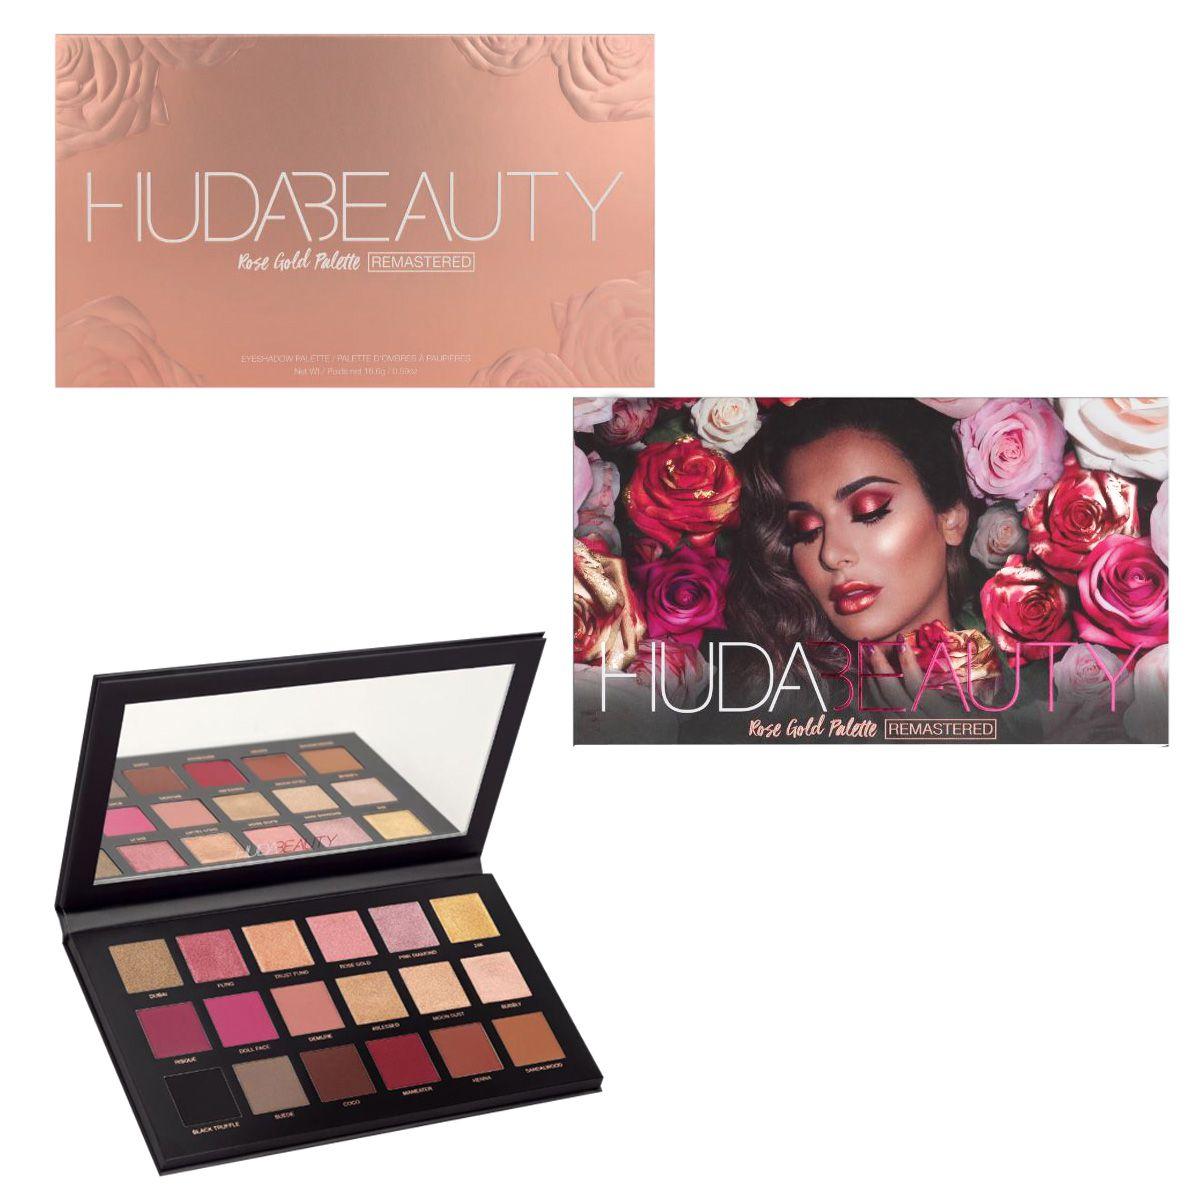 Kit Maquiagem Paletas De Sombra Huda Beauty